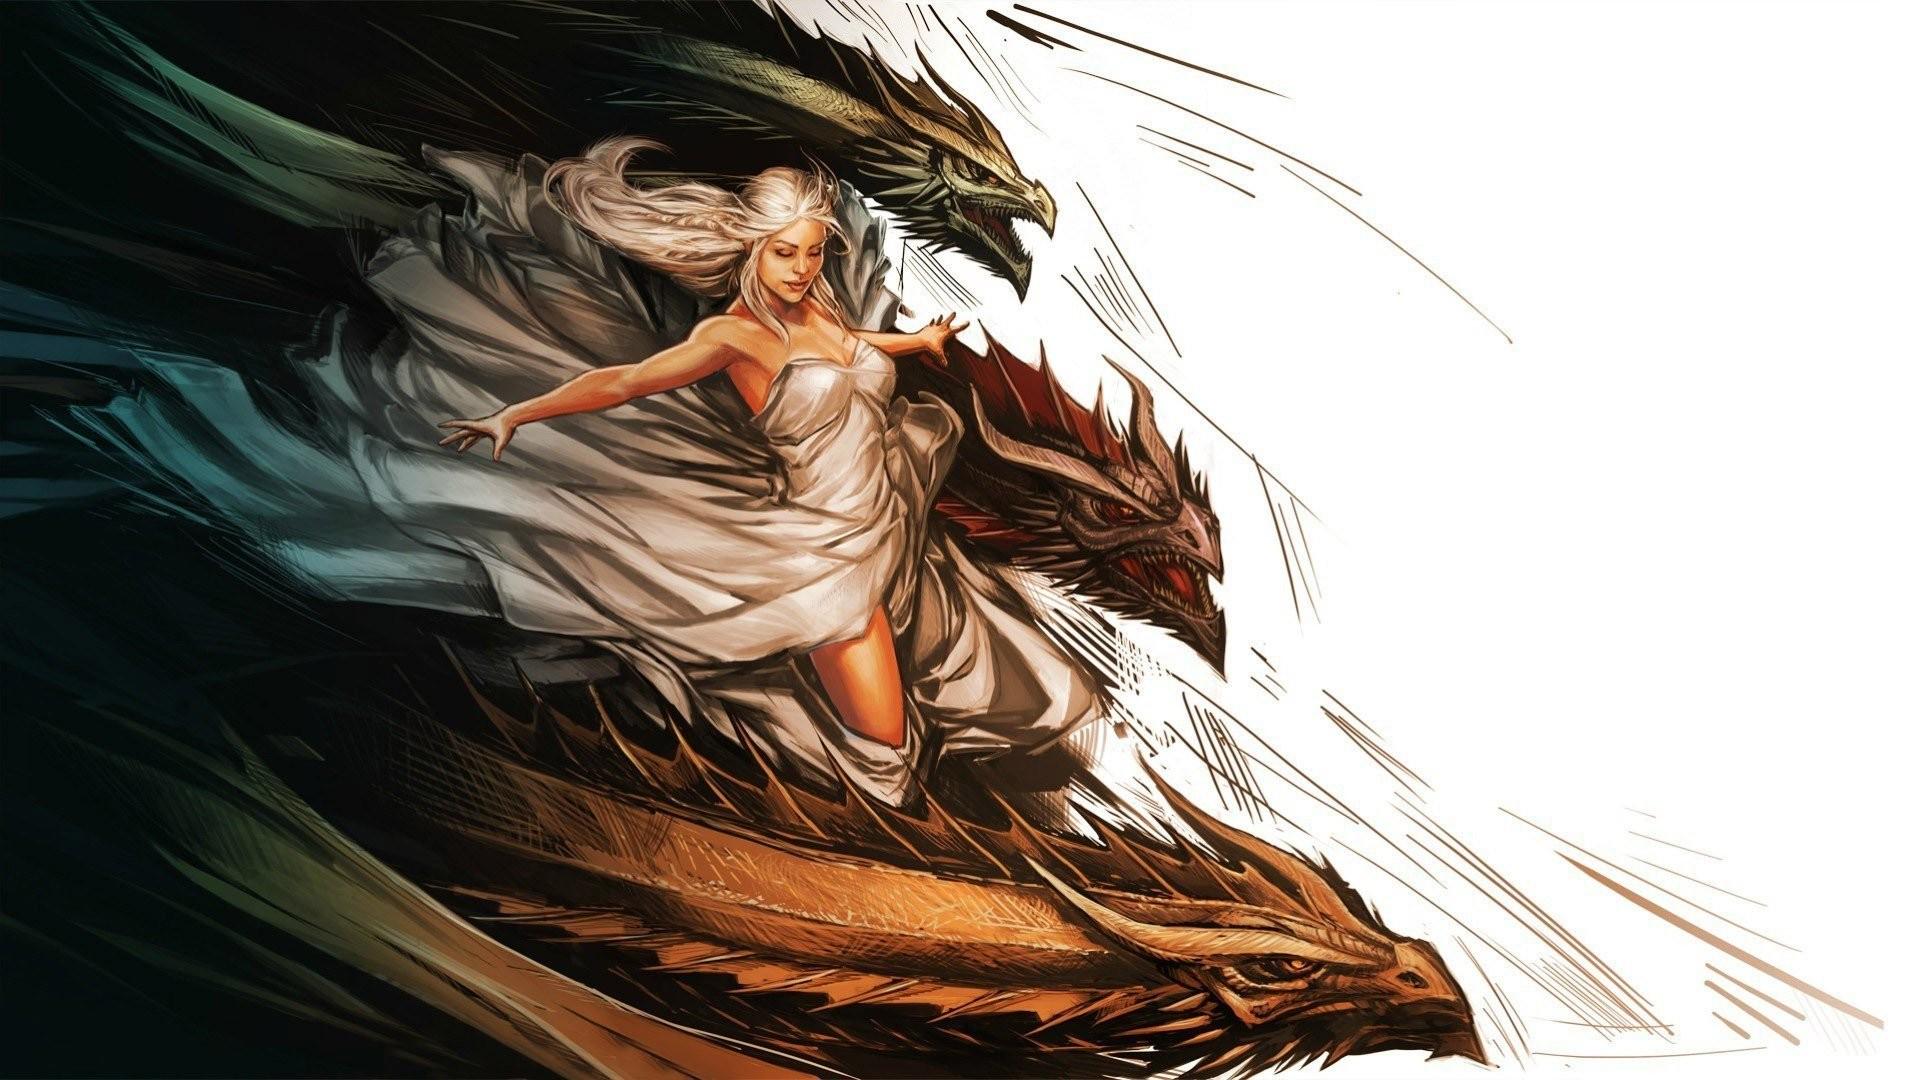 Daenerys Targaryen And Her Dragons